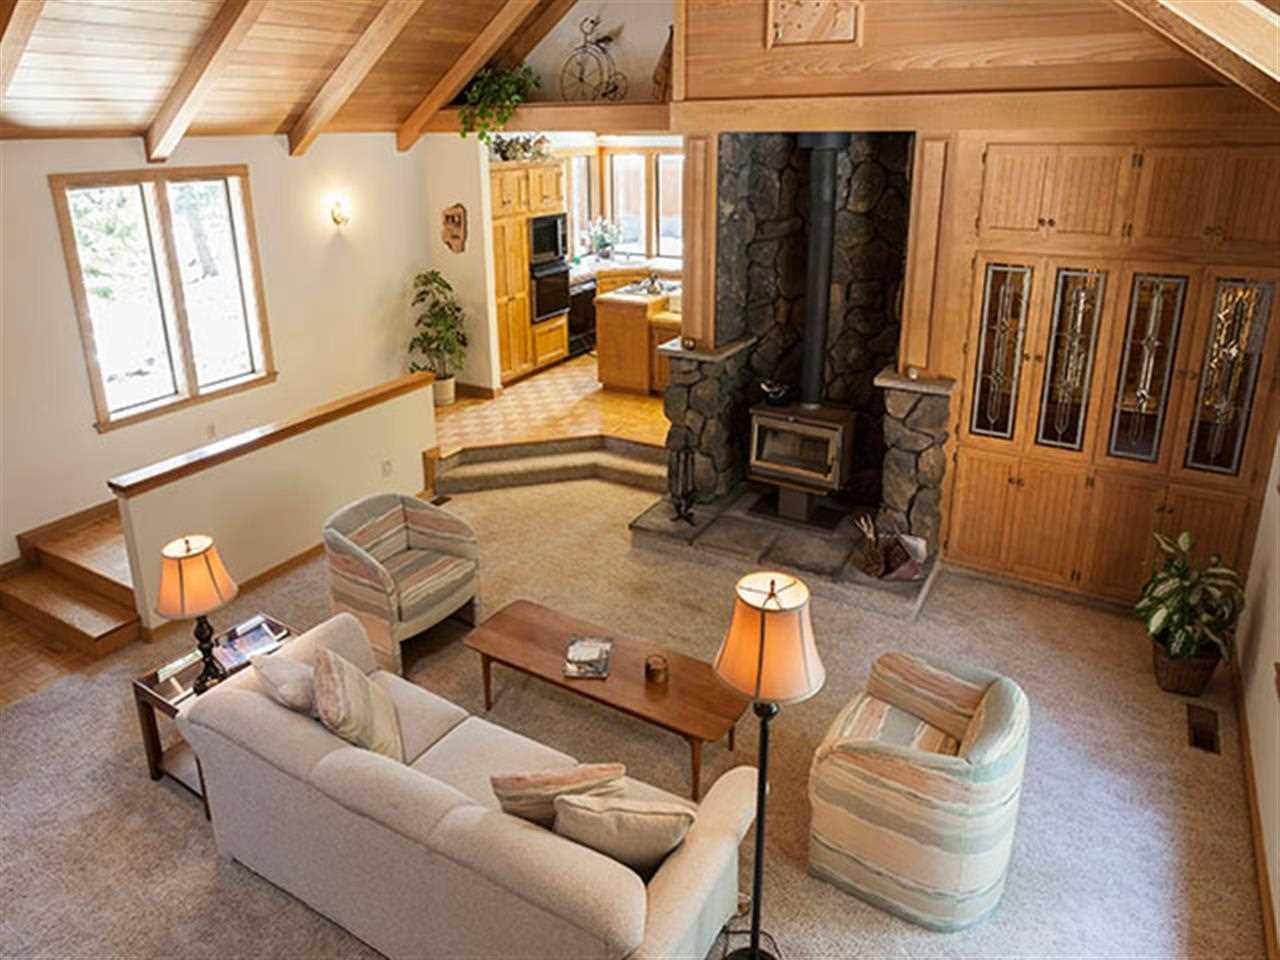 Additional photo for property listing at 14492 Tyrol Road 14492 Tyrol Road 特拉基, 加利福尼亚州 96161 美国